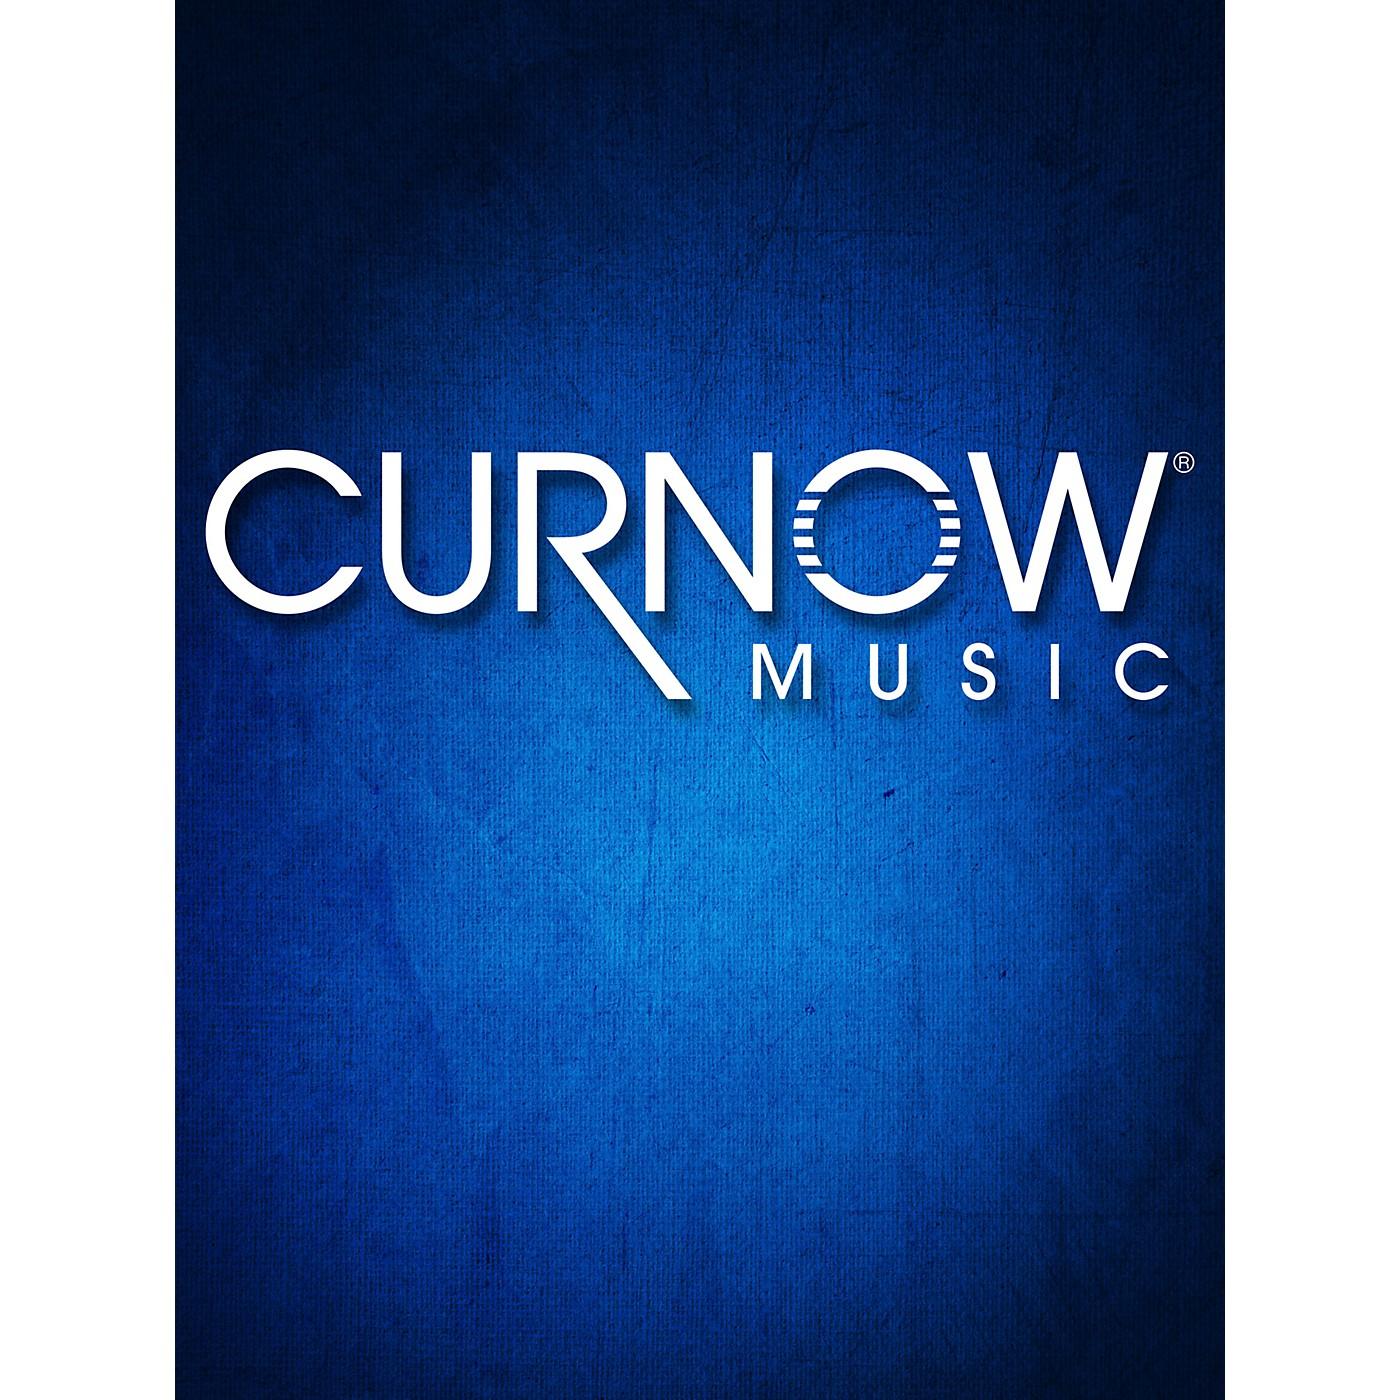 Hal Leonard Trumpet Tune (Grade 2 - Score Only) Concert Band Level 2 Arranged by Stephen Bulla thumbnail